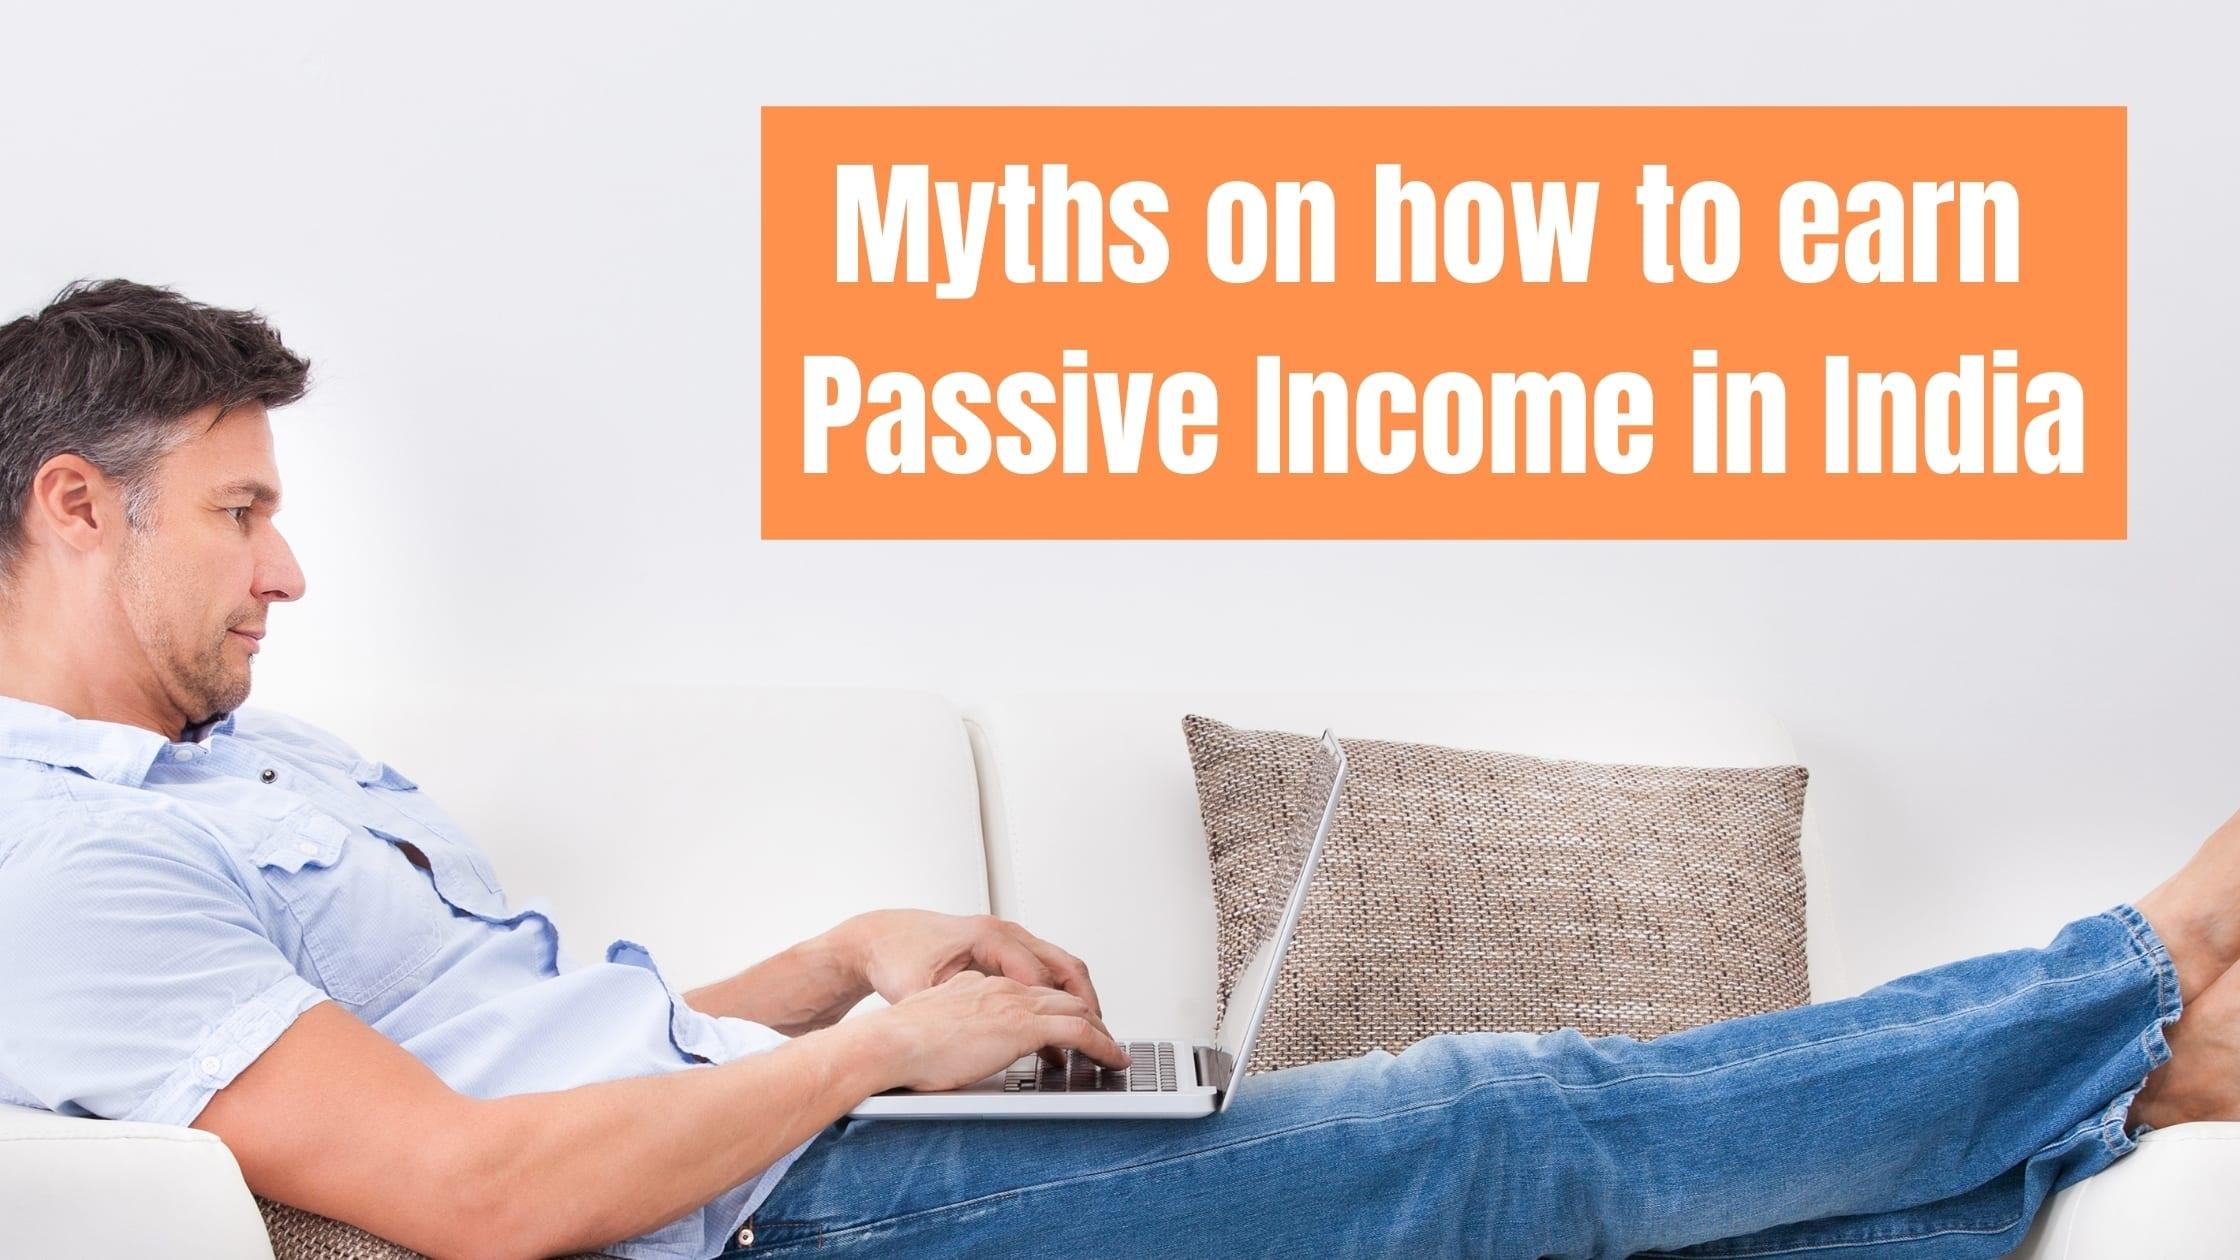 Myths on how to earn PasMyths on how to earn Passive Income in Indiasive Income in India